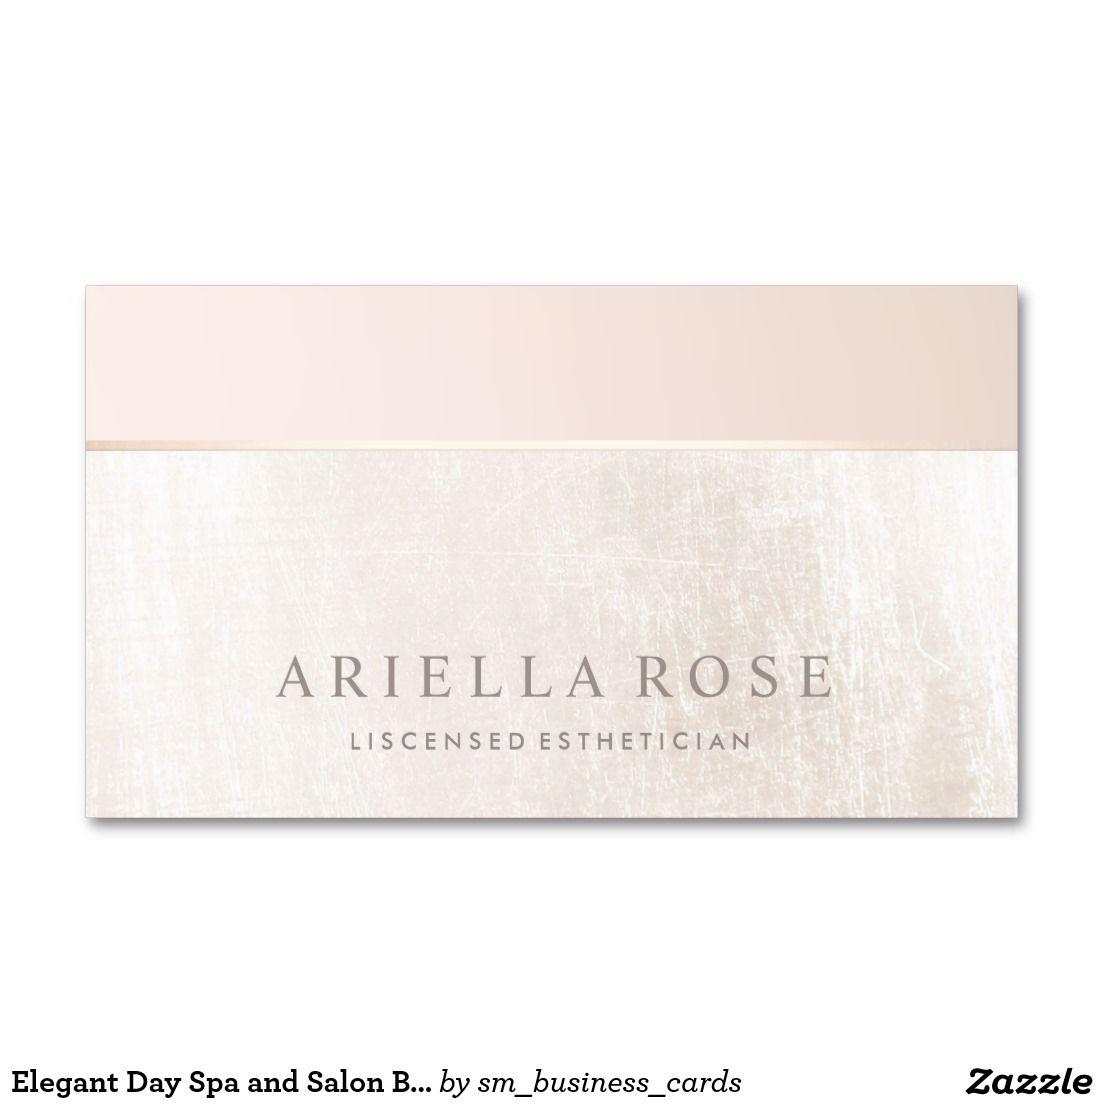 Elegant day spa and salon blush pink white marble double sided elegant day spa and salon blush pink white marble double sided standard business cards magicingreecefo Choice Image